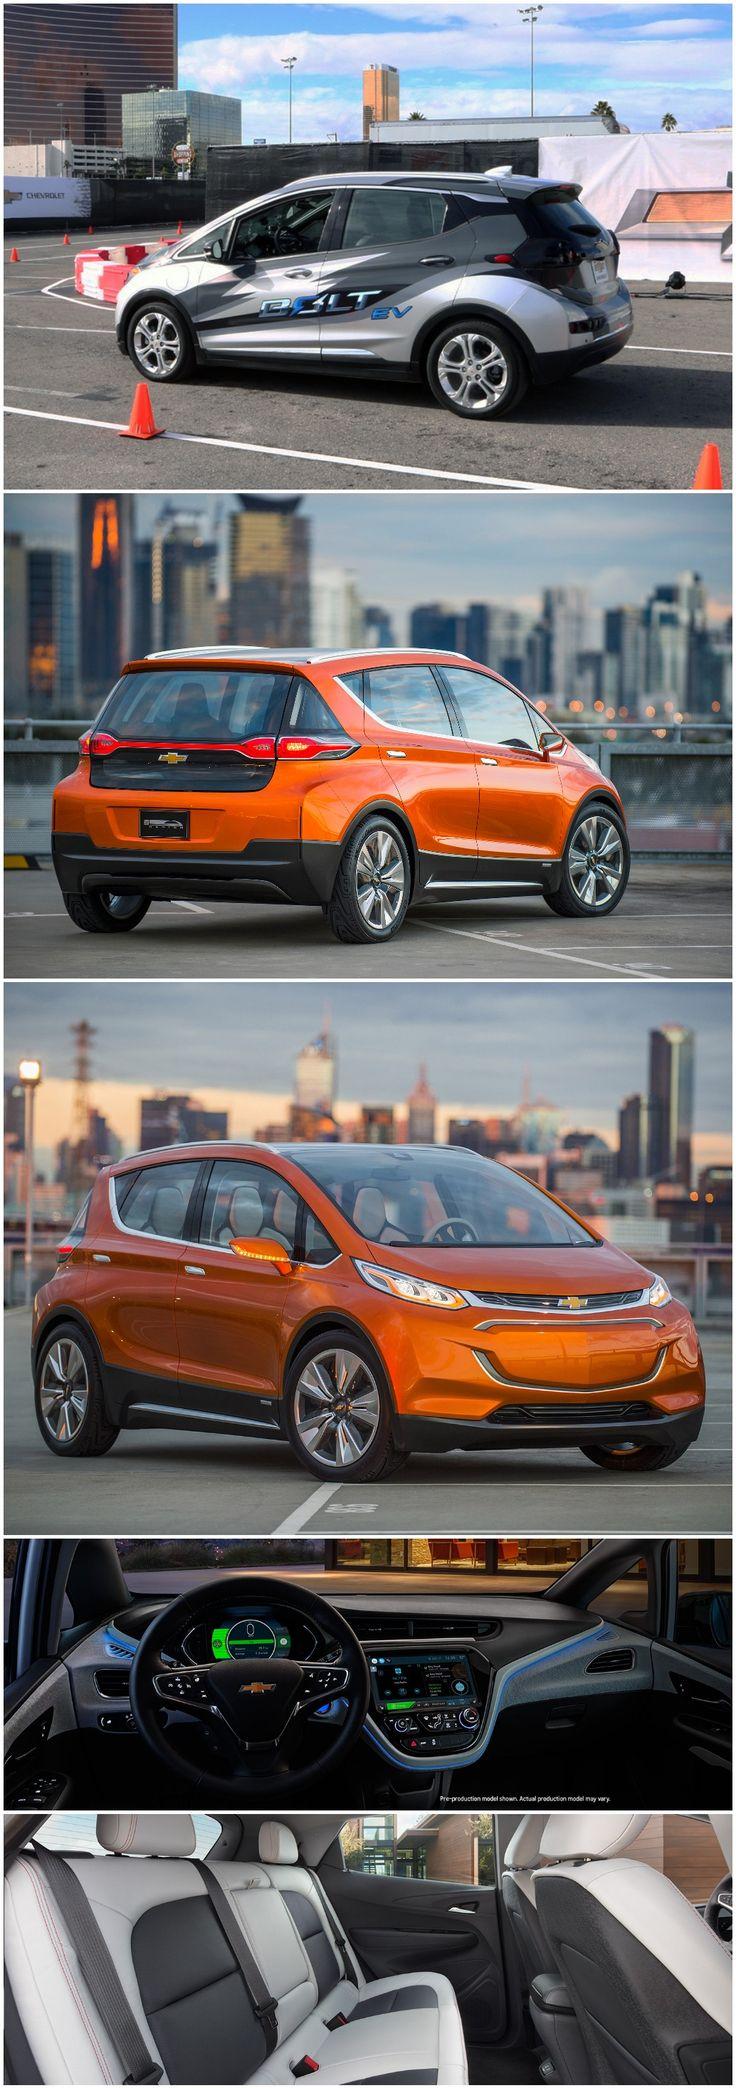 Chevrolet bolt ev price announced cheaper than tesla model 3